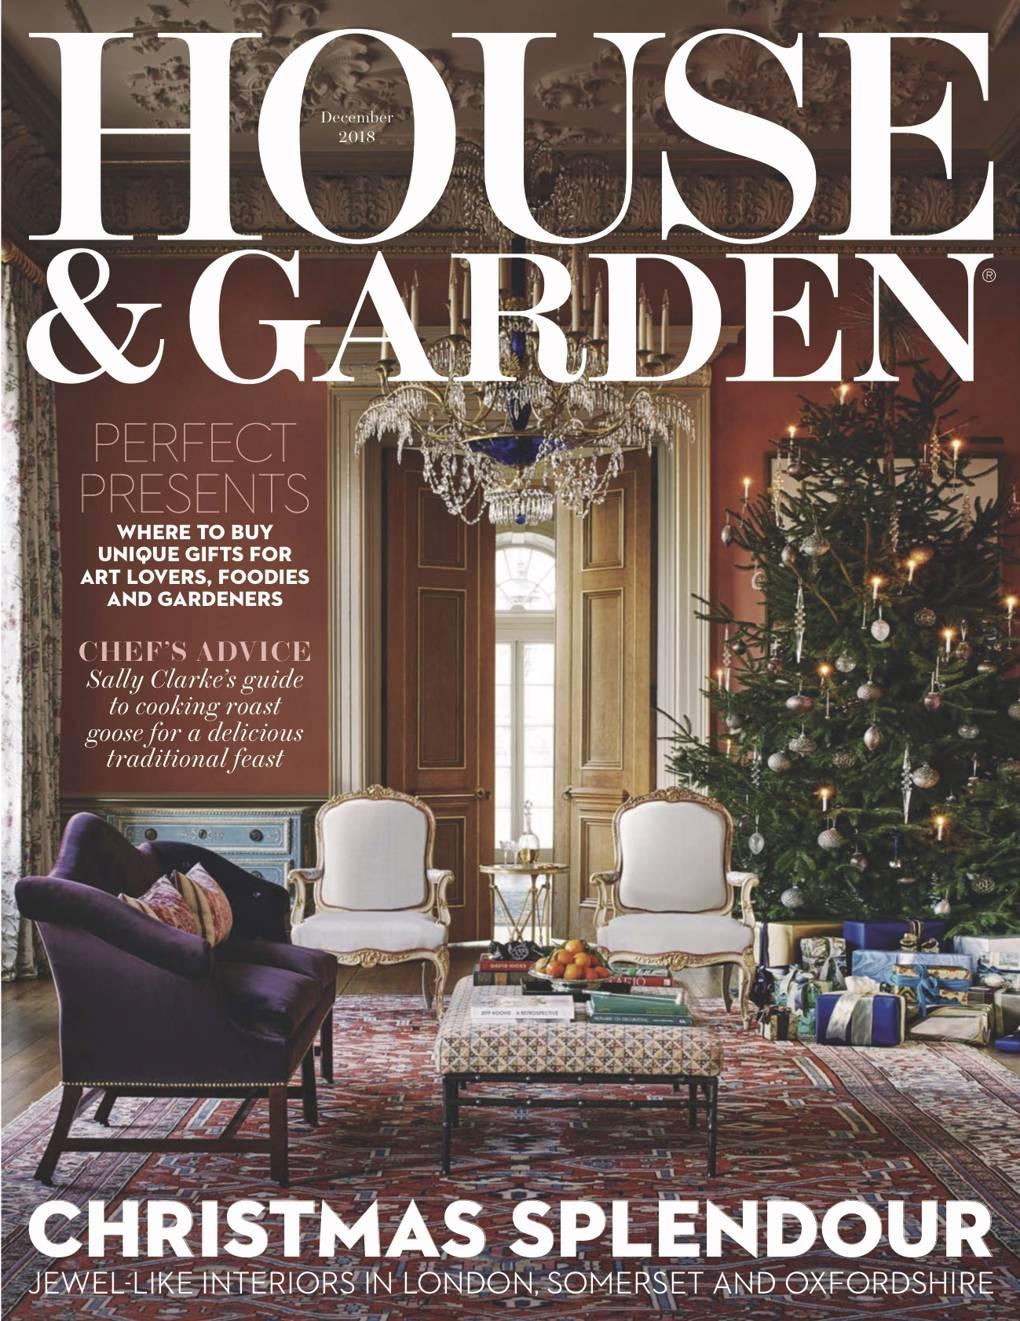 House & Garden December 5 issue   House & Garden